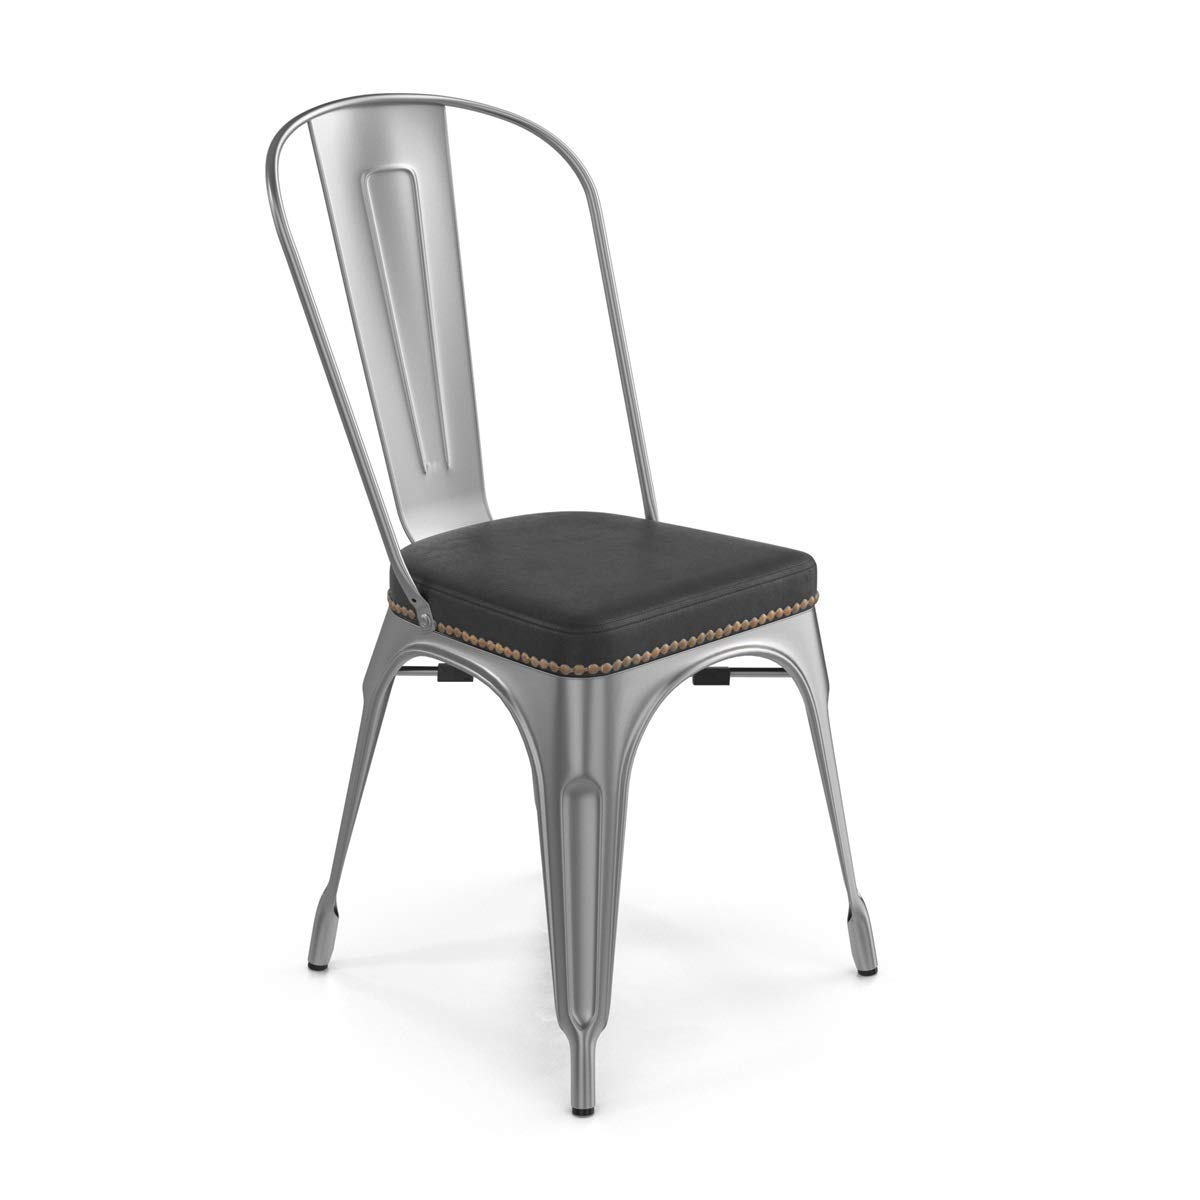 Bastille Upholstered Cafe Stacking Chair, Set of 2, Silver